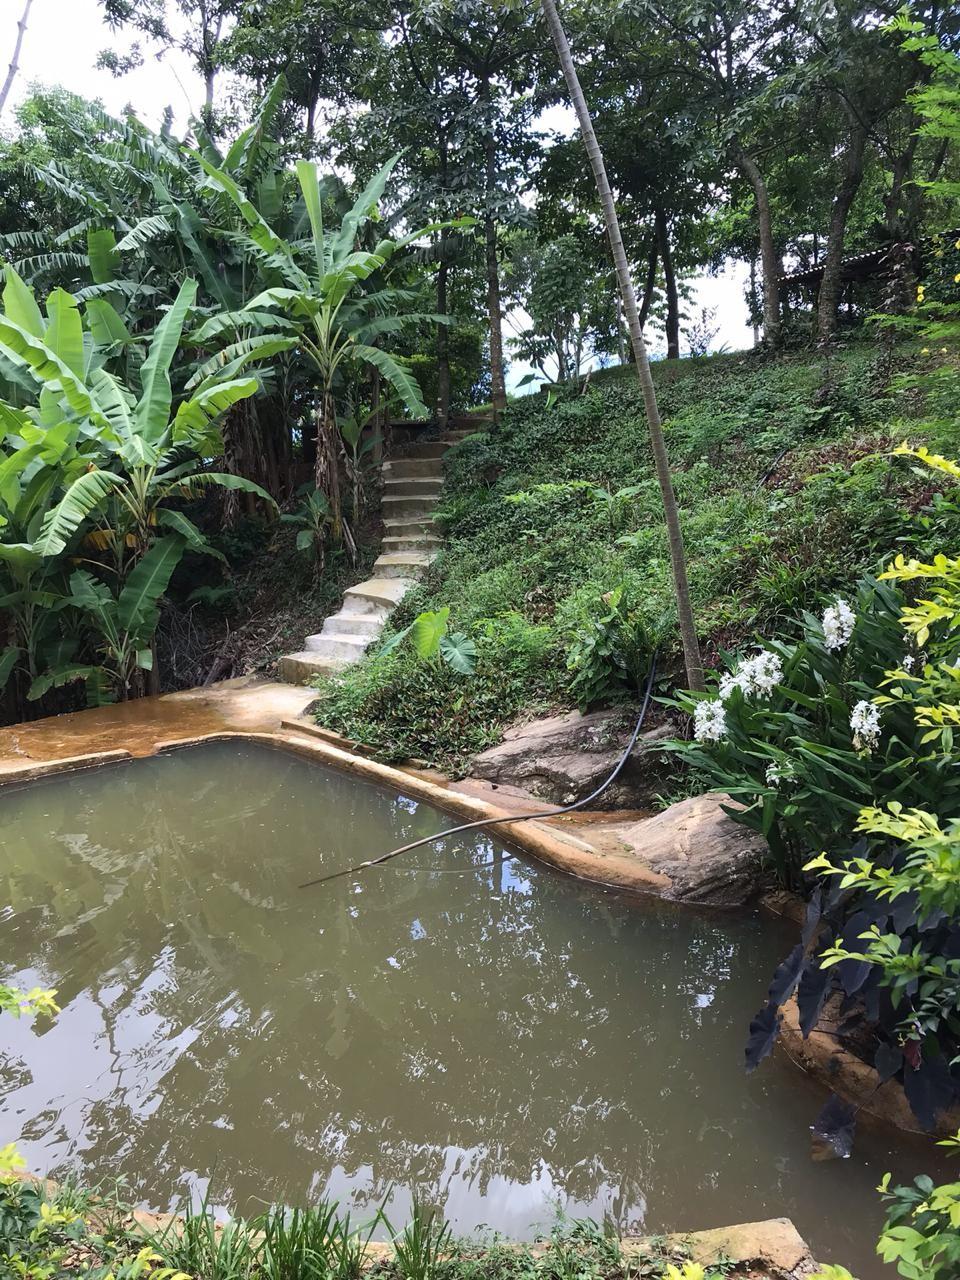 Sítio Liberdade, em Itaguaí